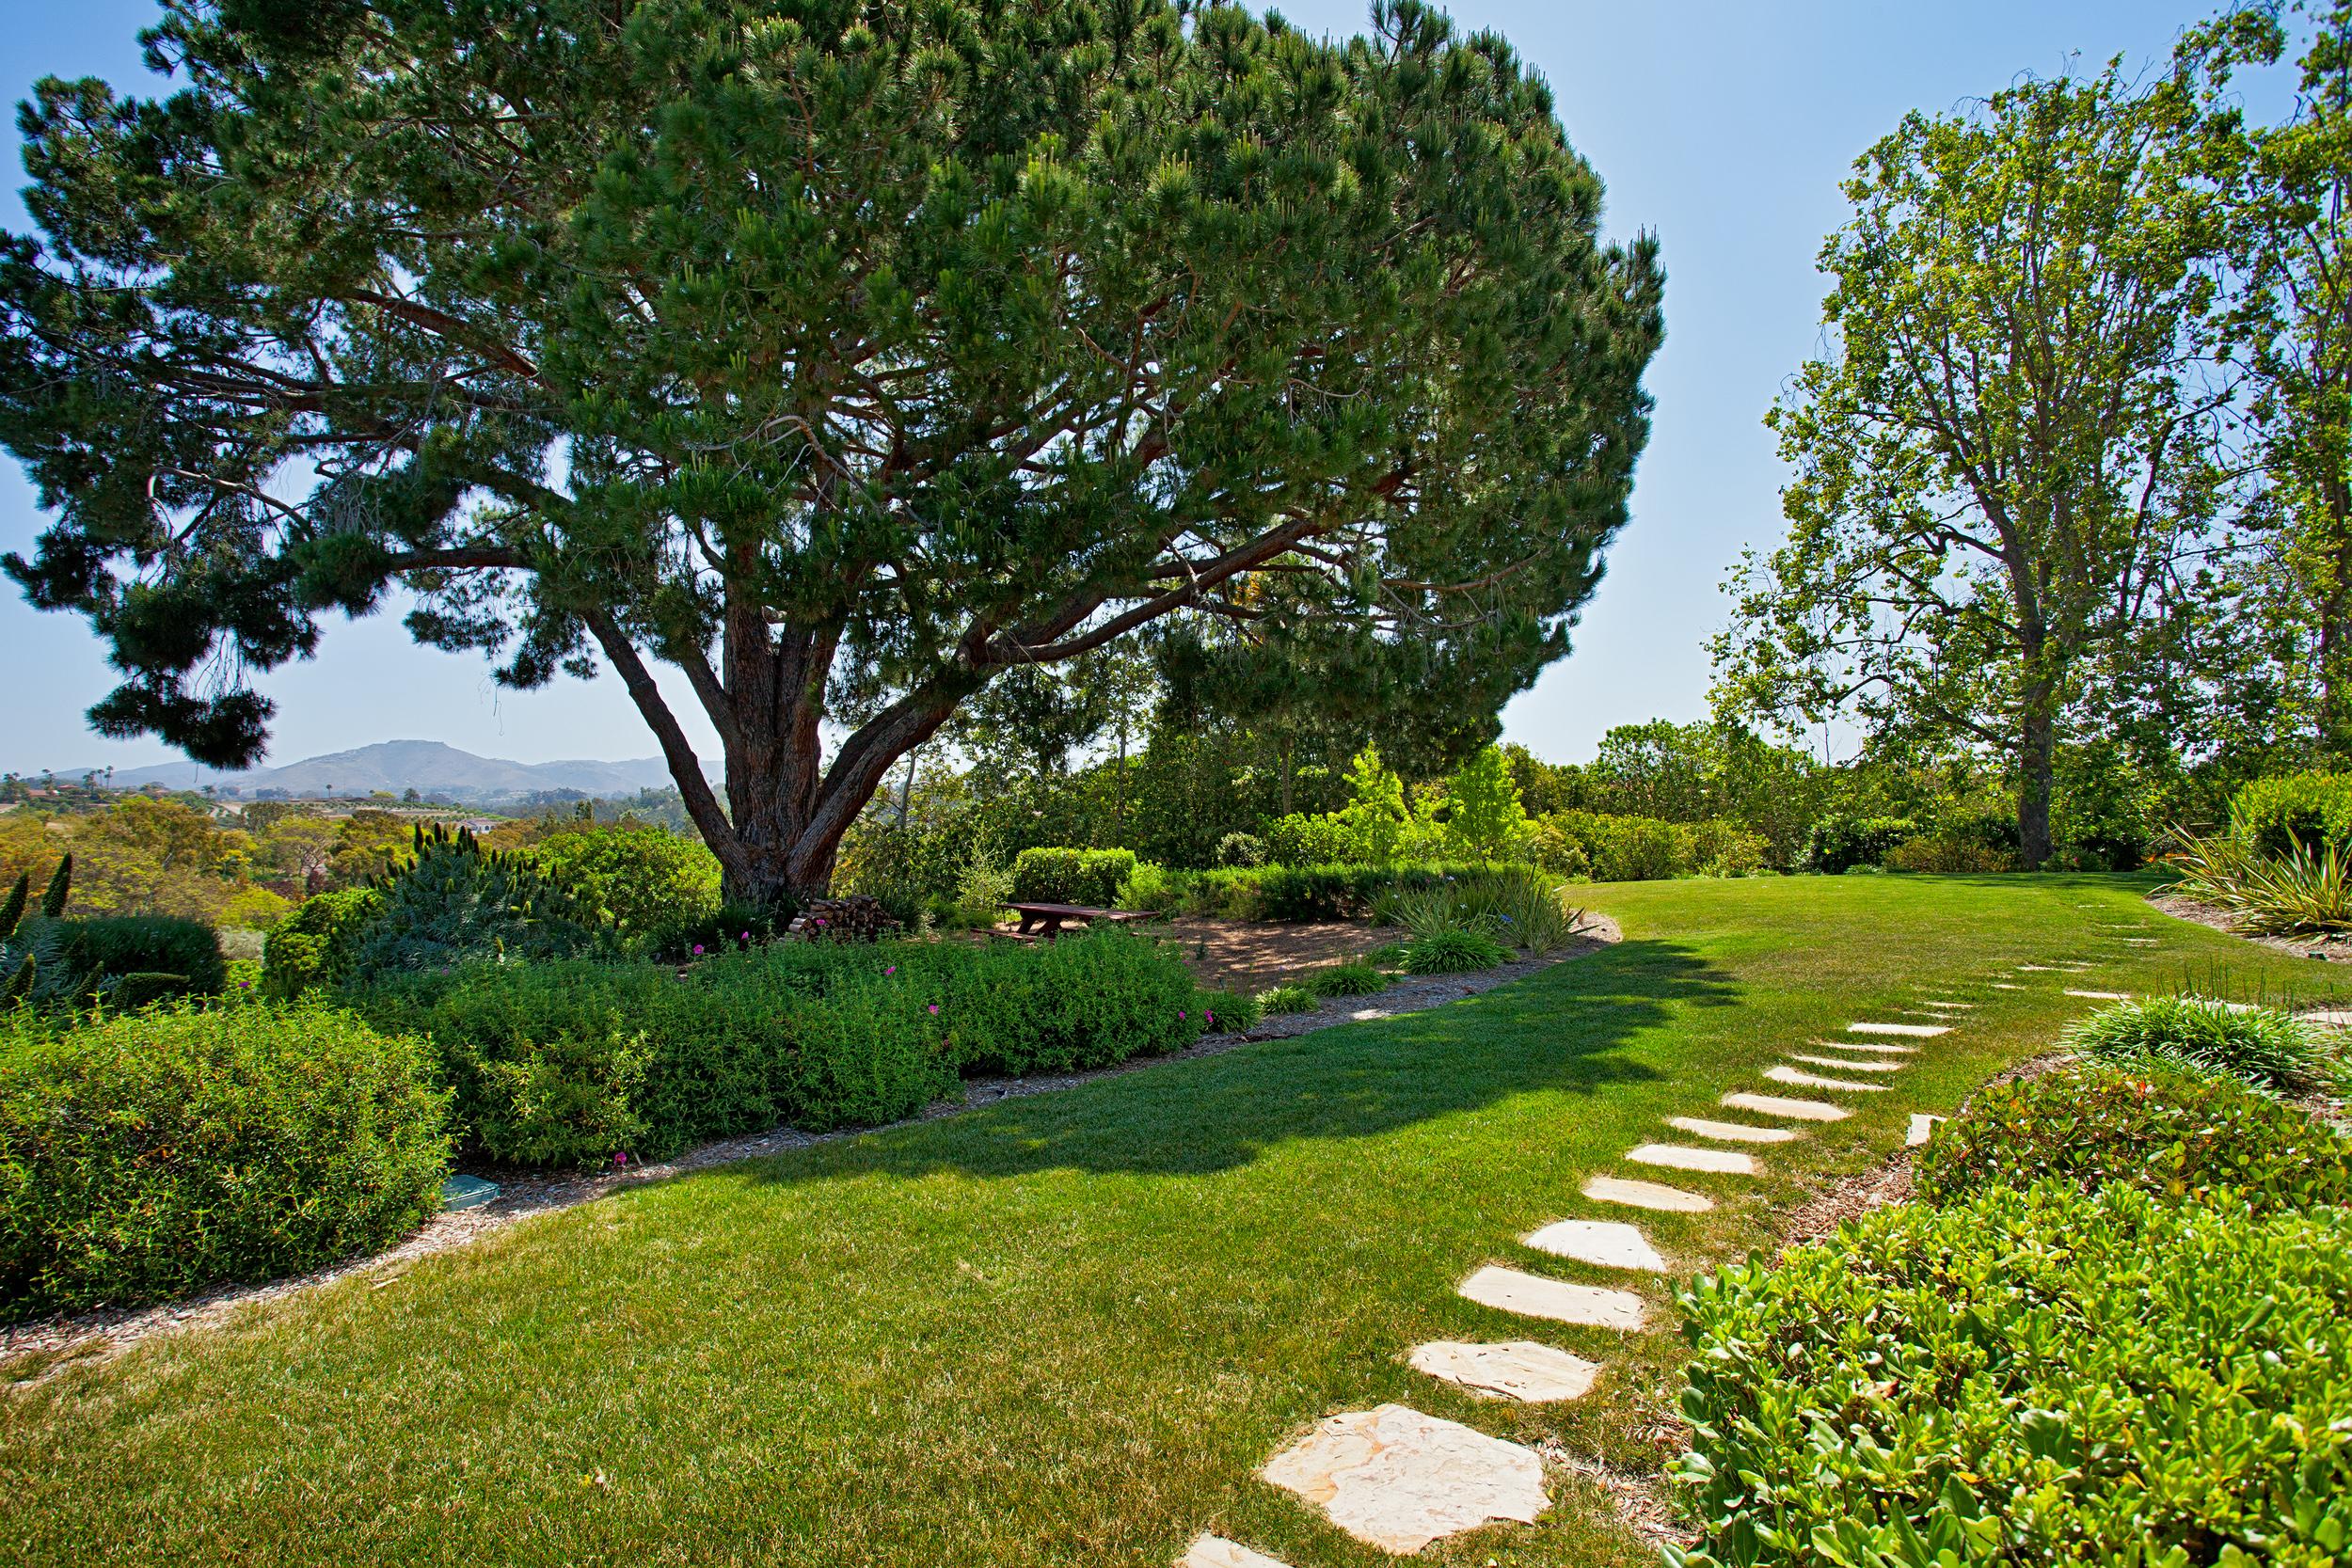 Sold 2017 Laura Represented Seller -  Rancho Santa Fe Covenant, CA 92067